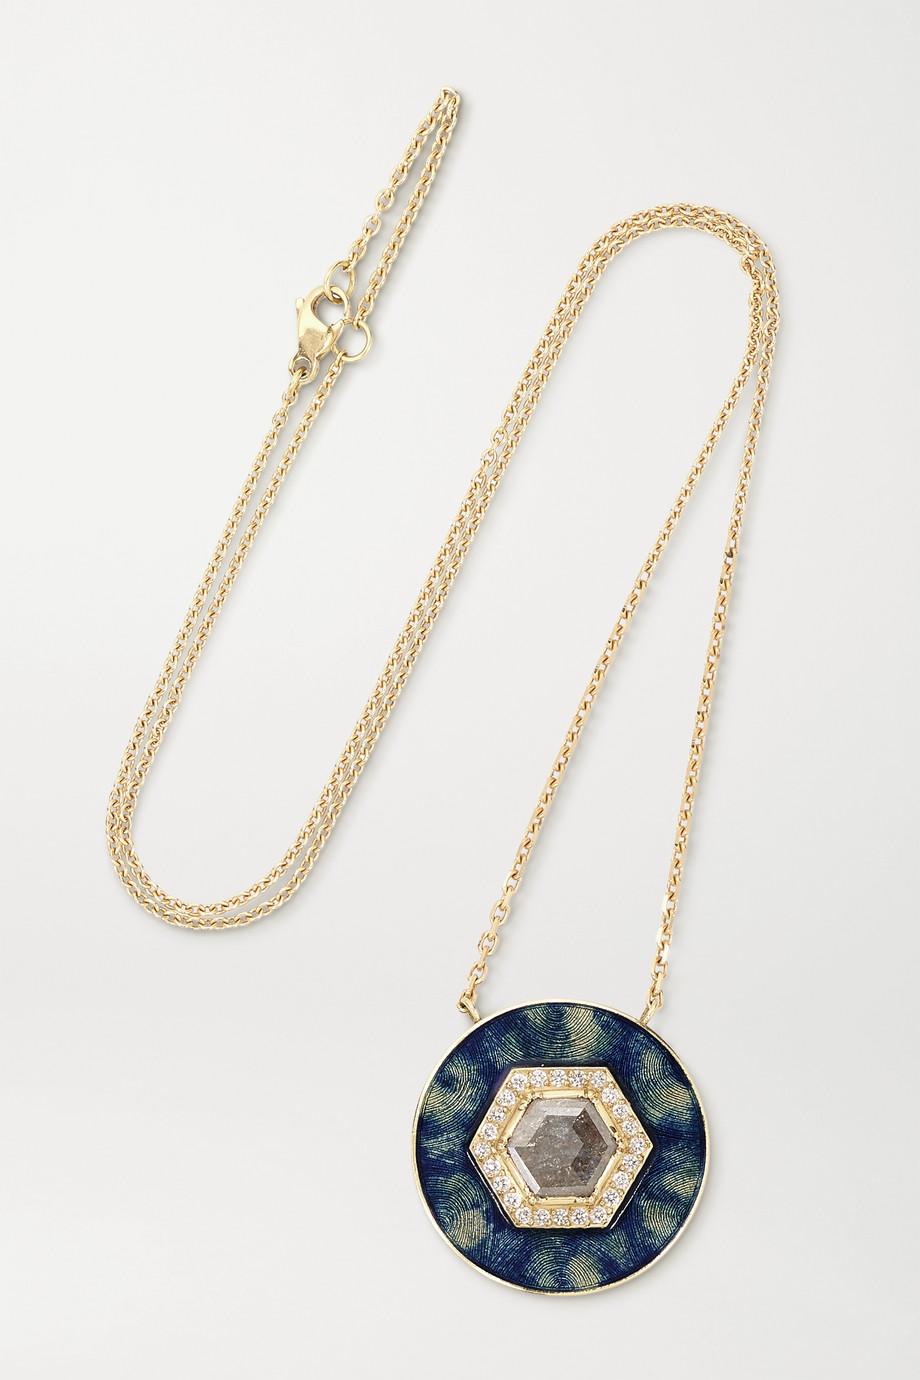 Brooke Gregson Mandala 18-karat gold, enamel and diamond necklace